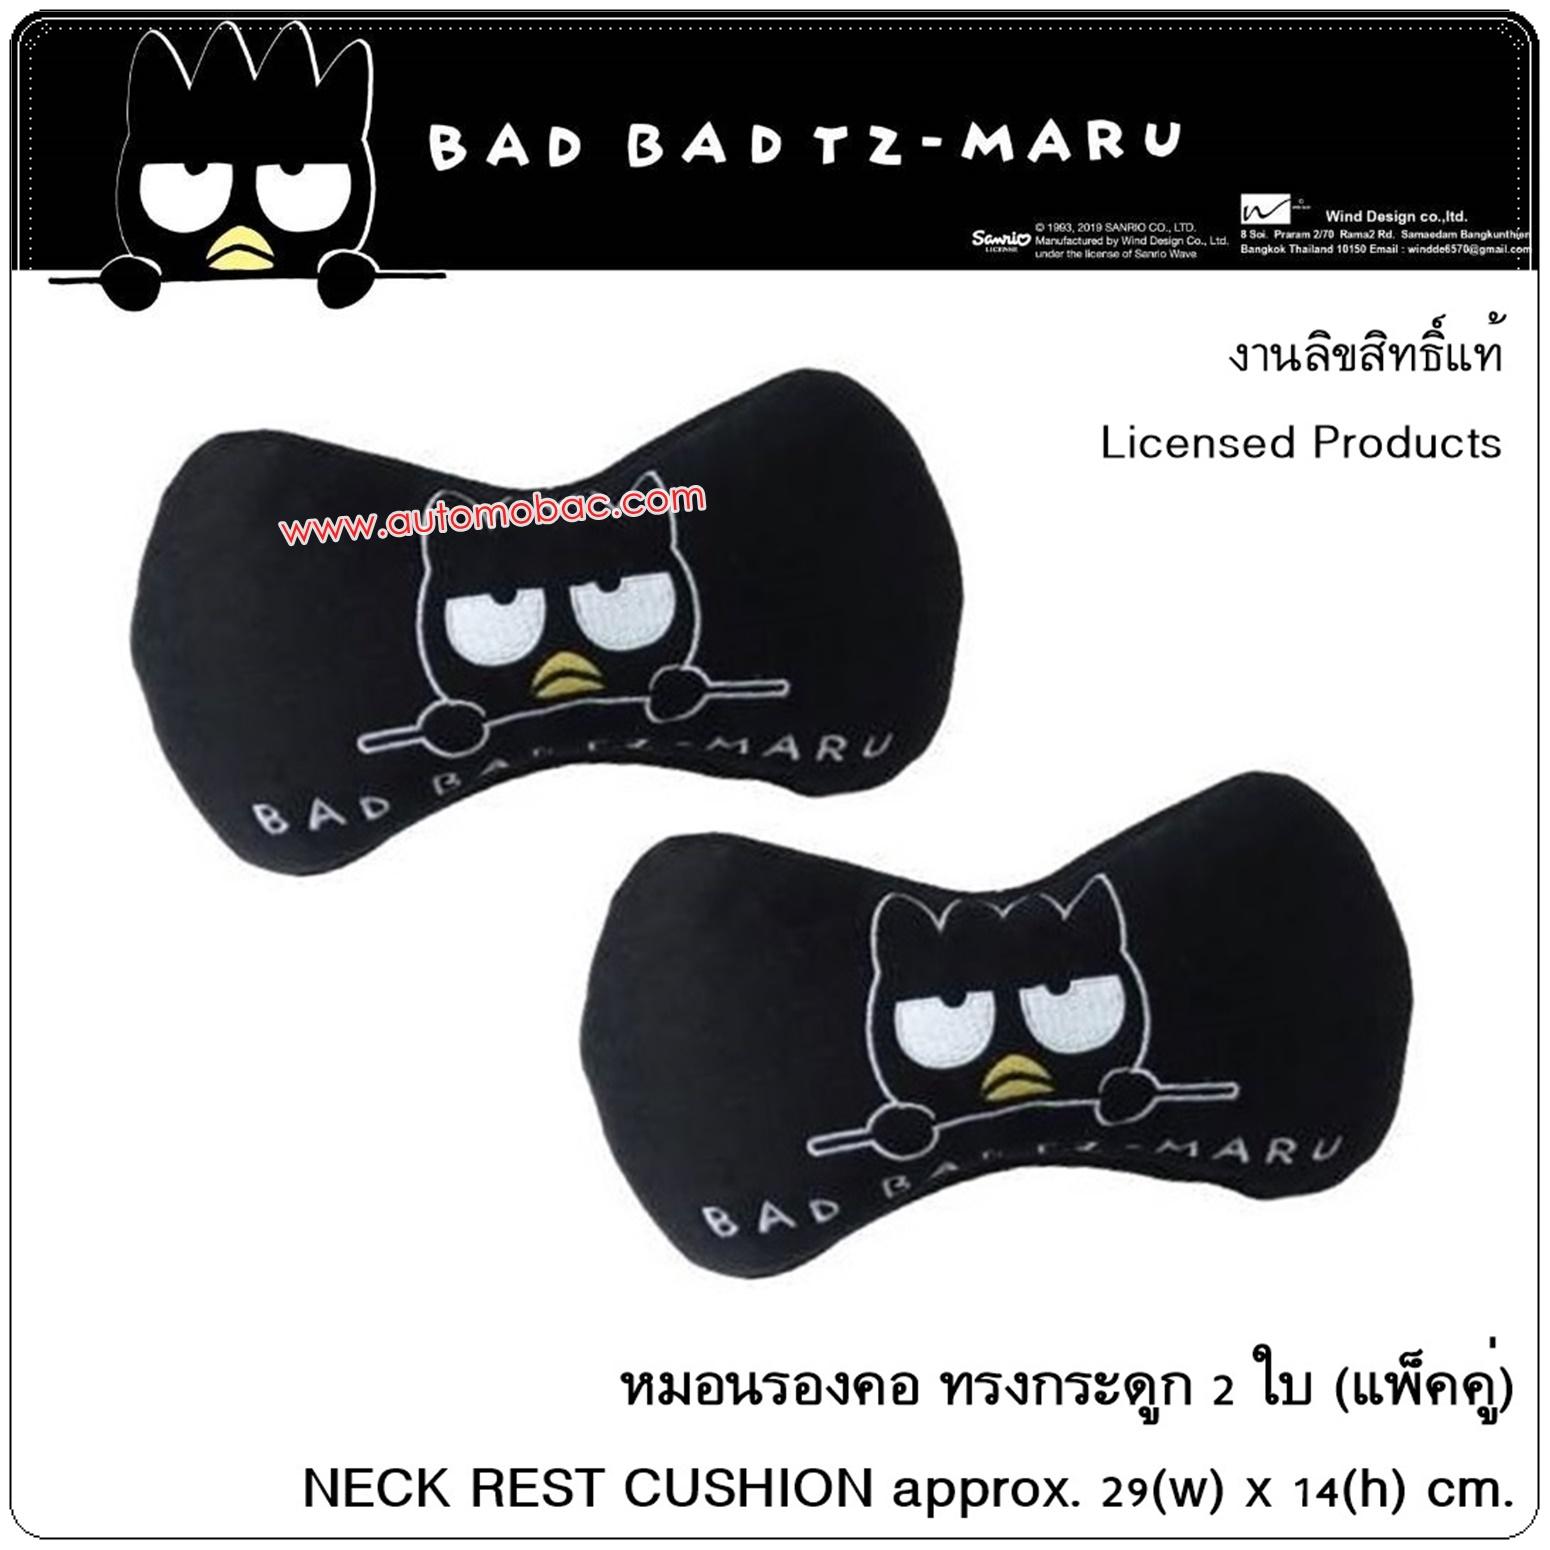 Bad Badtz-Maru BLACK แบดมารุ สีดำ หมอนรองคอ ทรงกระดูก 2 ชิ้น NECK CUSHION ลิขสิทธิ์แท้